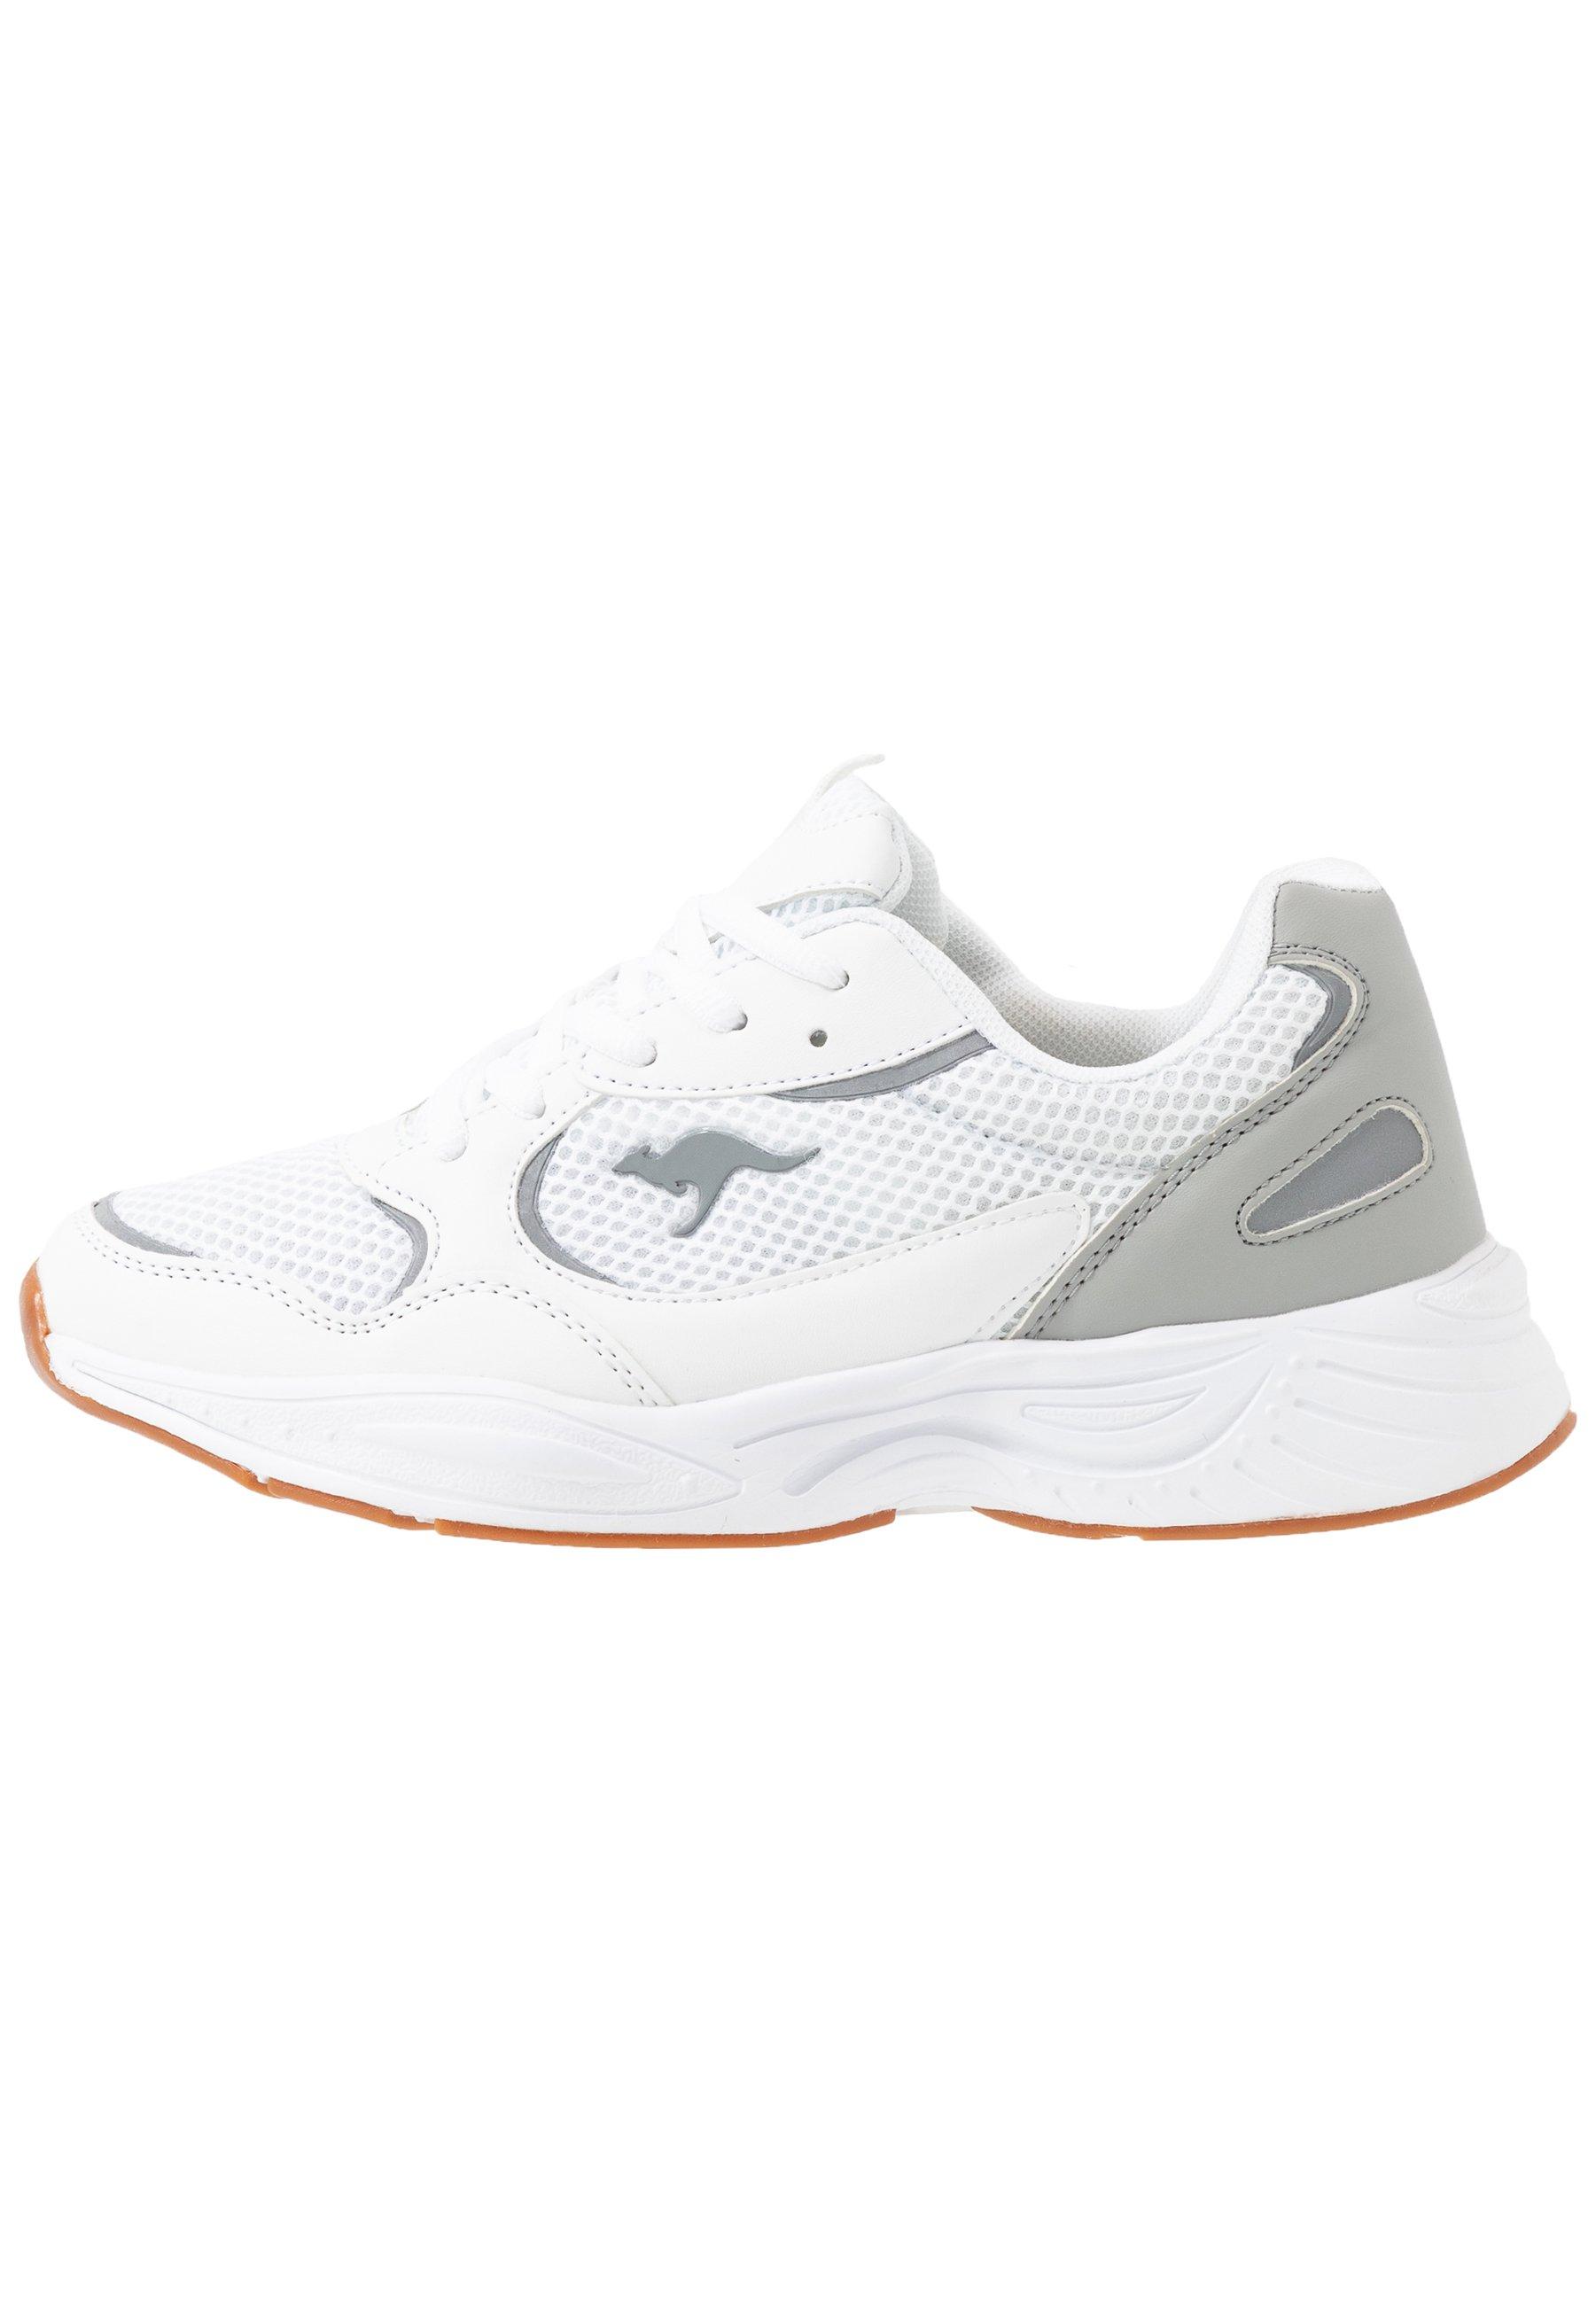 Kangaroos K-pow - Sneakers White/vapor Grey